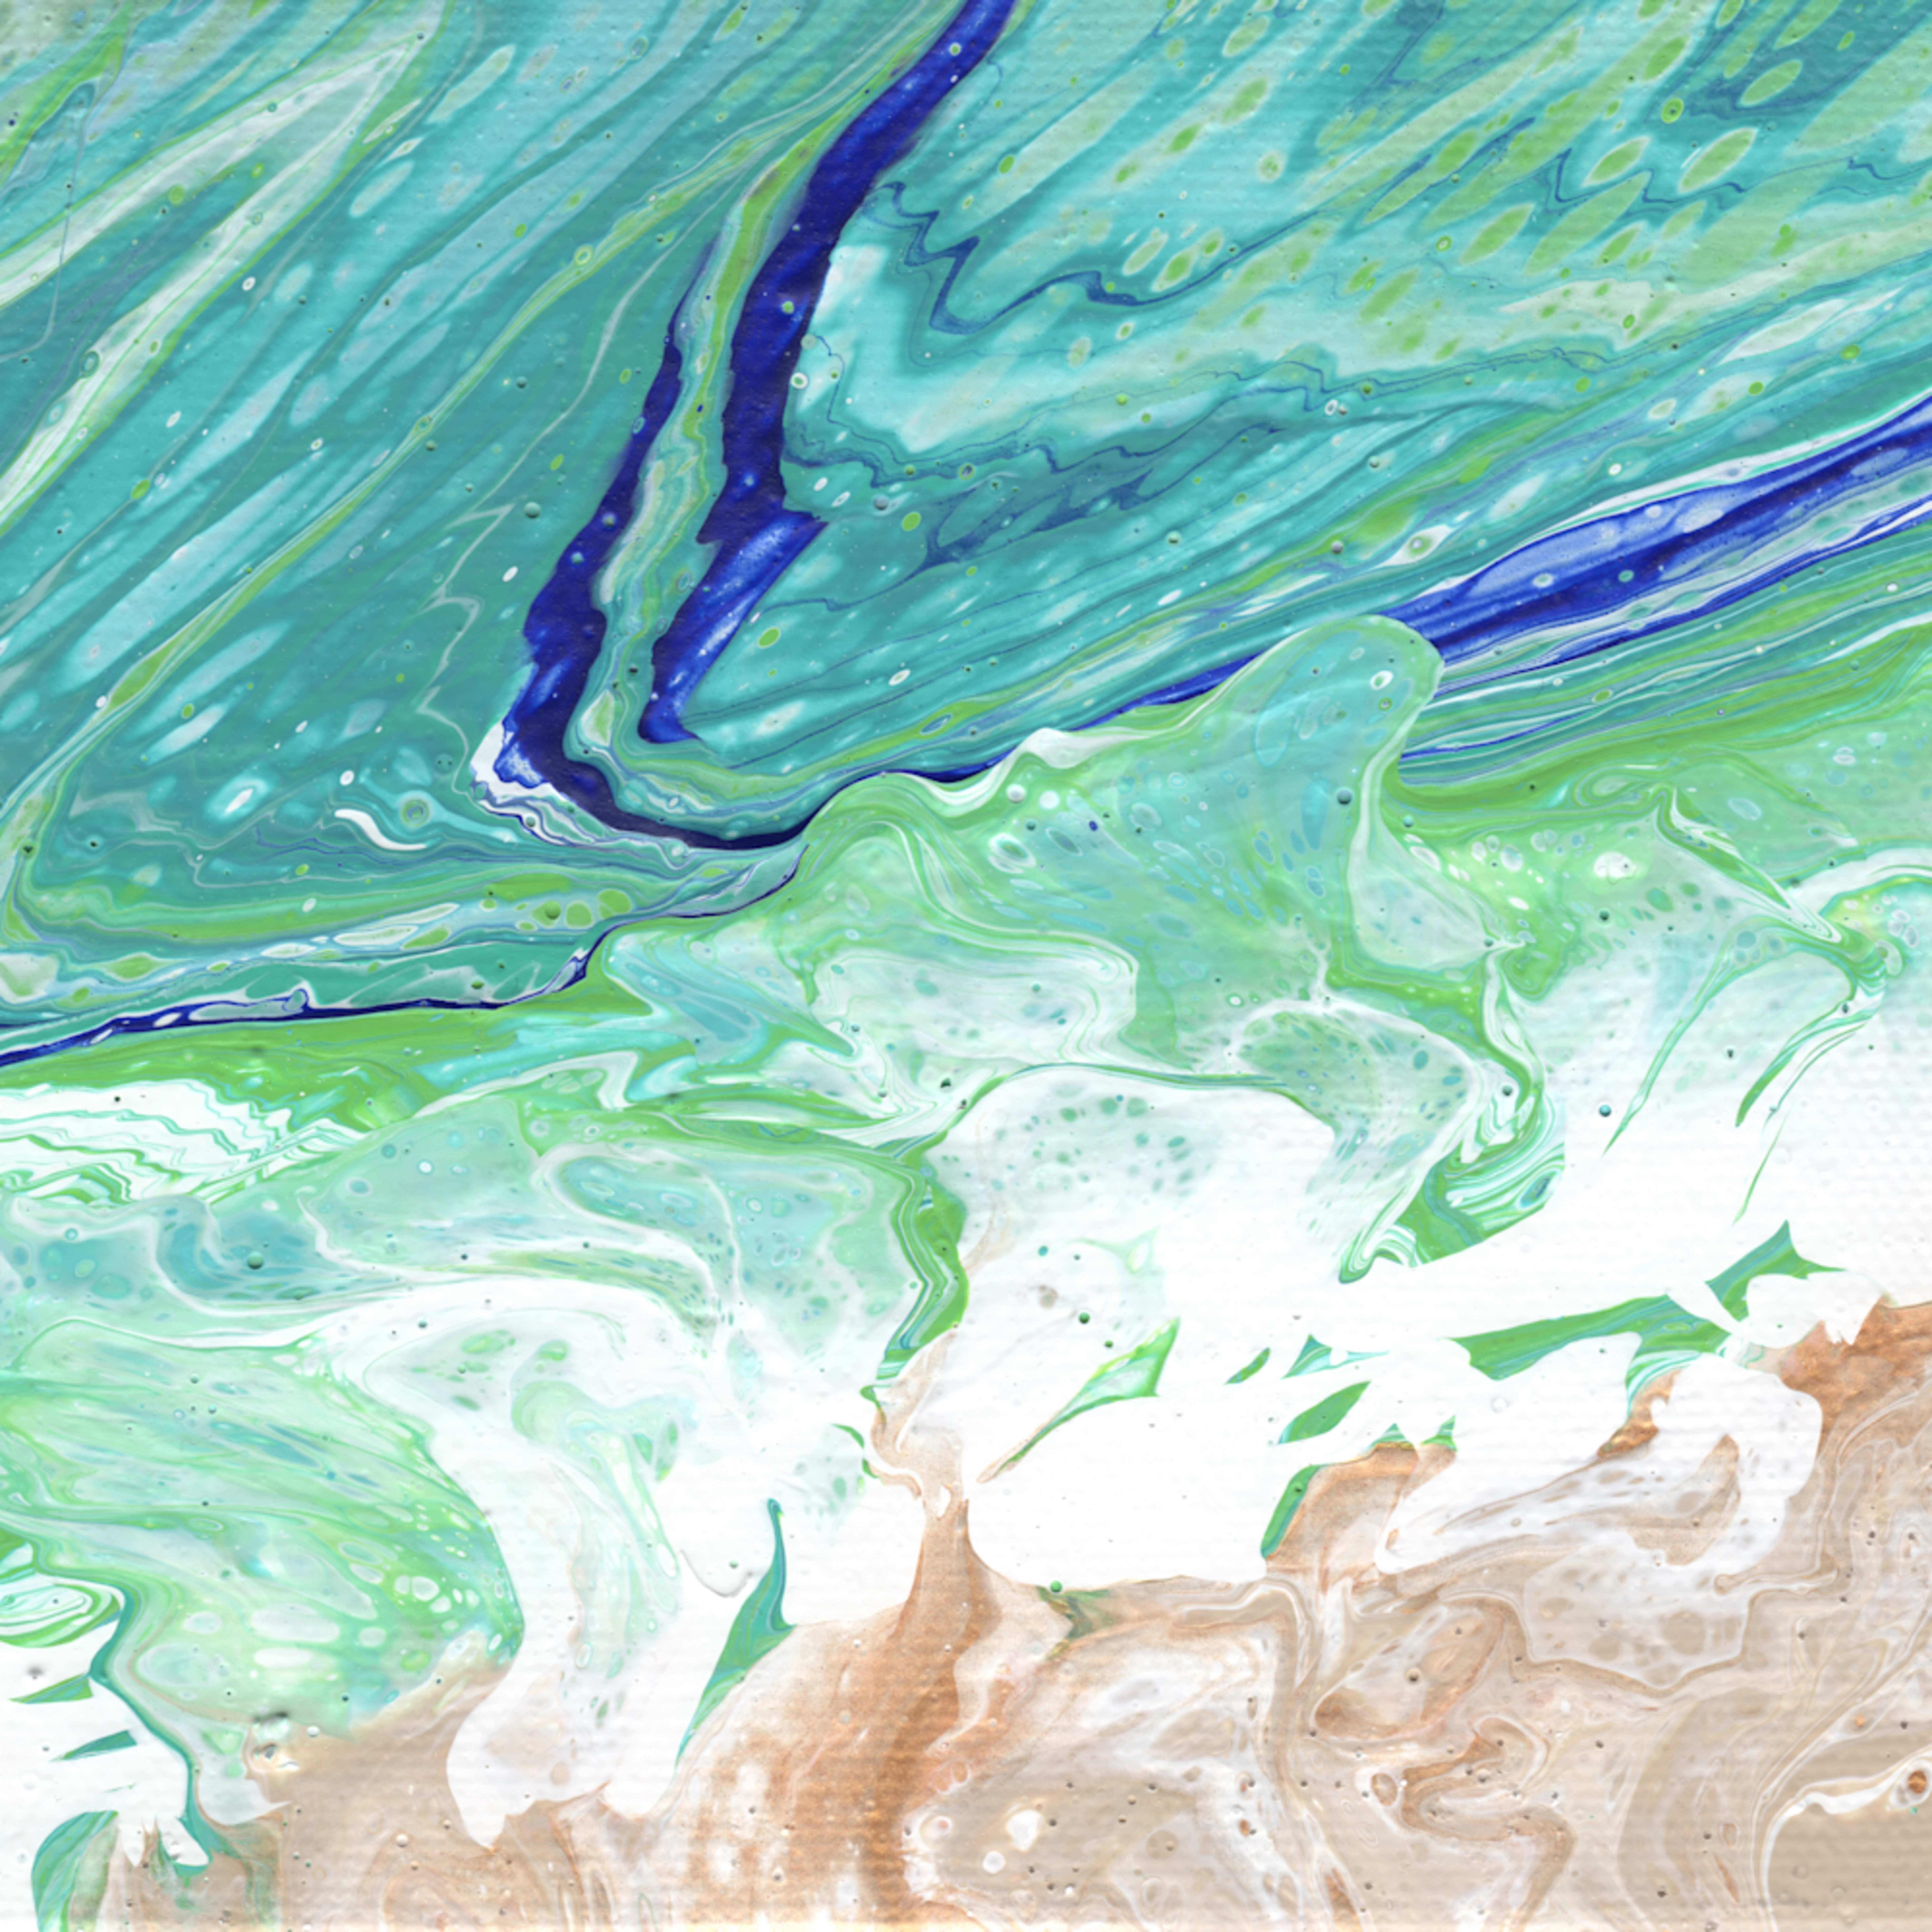 Water s edge 1 g9athm